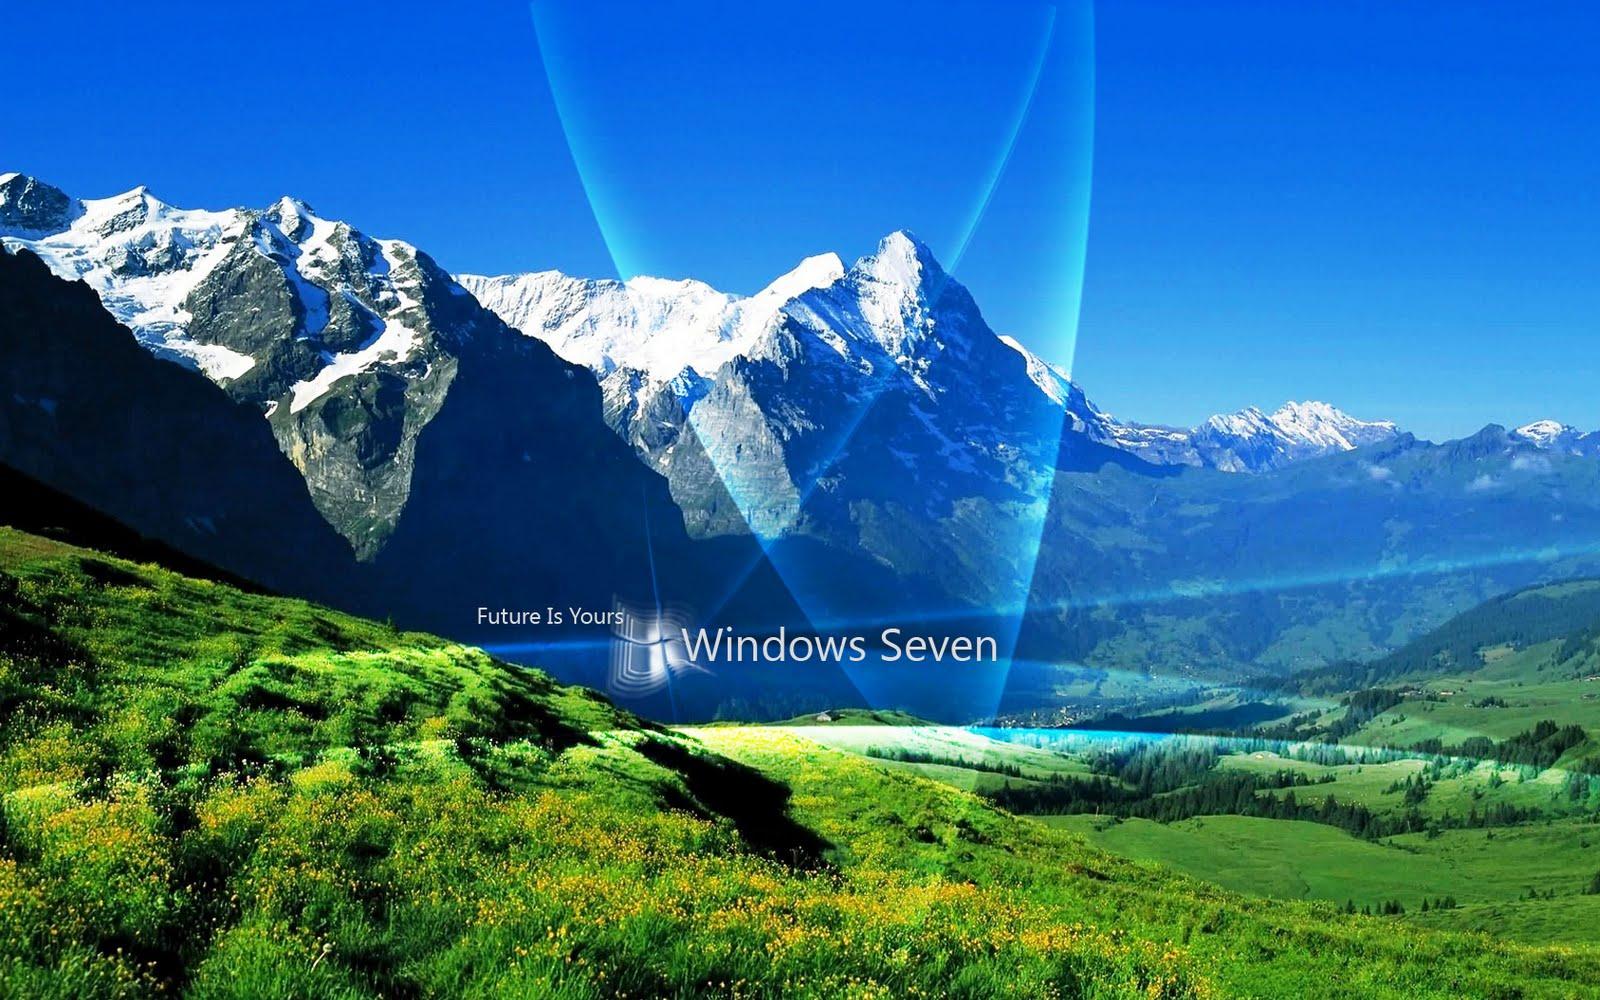 http://3.bp.blogspot.com/-LqVaaQ_yFuU/TYYDvgxU0QI/AAAAAAAADhU/9kDfRBeUyXs/s1600/1246007064_1680x1050_windows-7-landscape-wallpaper.jpg